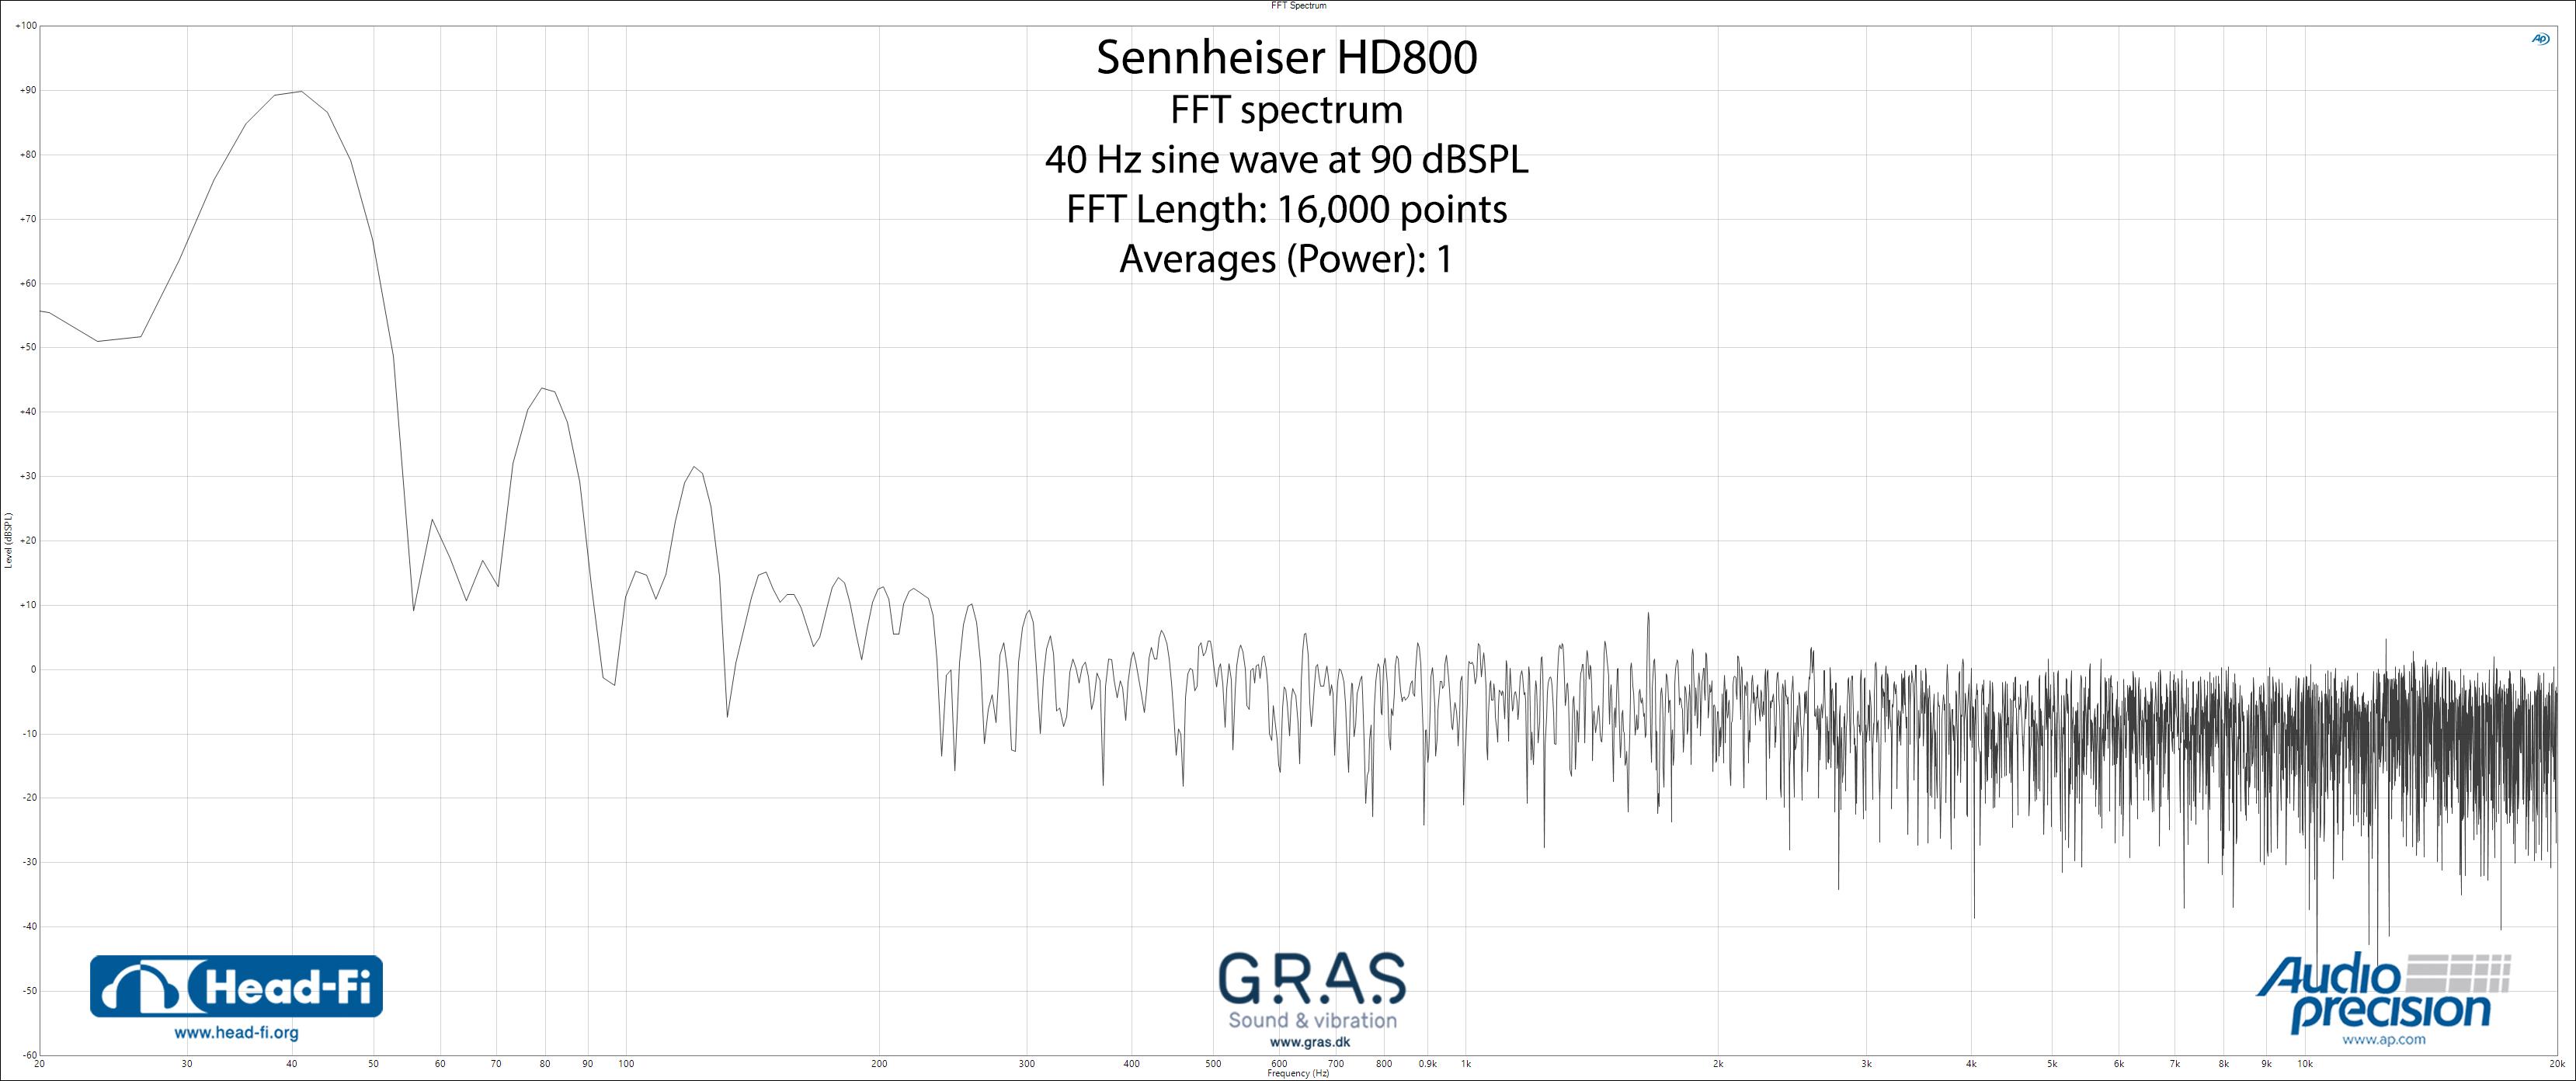 Sennheiser-HD800_FFT-Spectrum_16000-points-average-1_corrected-label.jpg